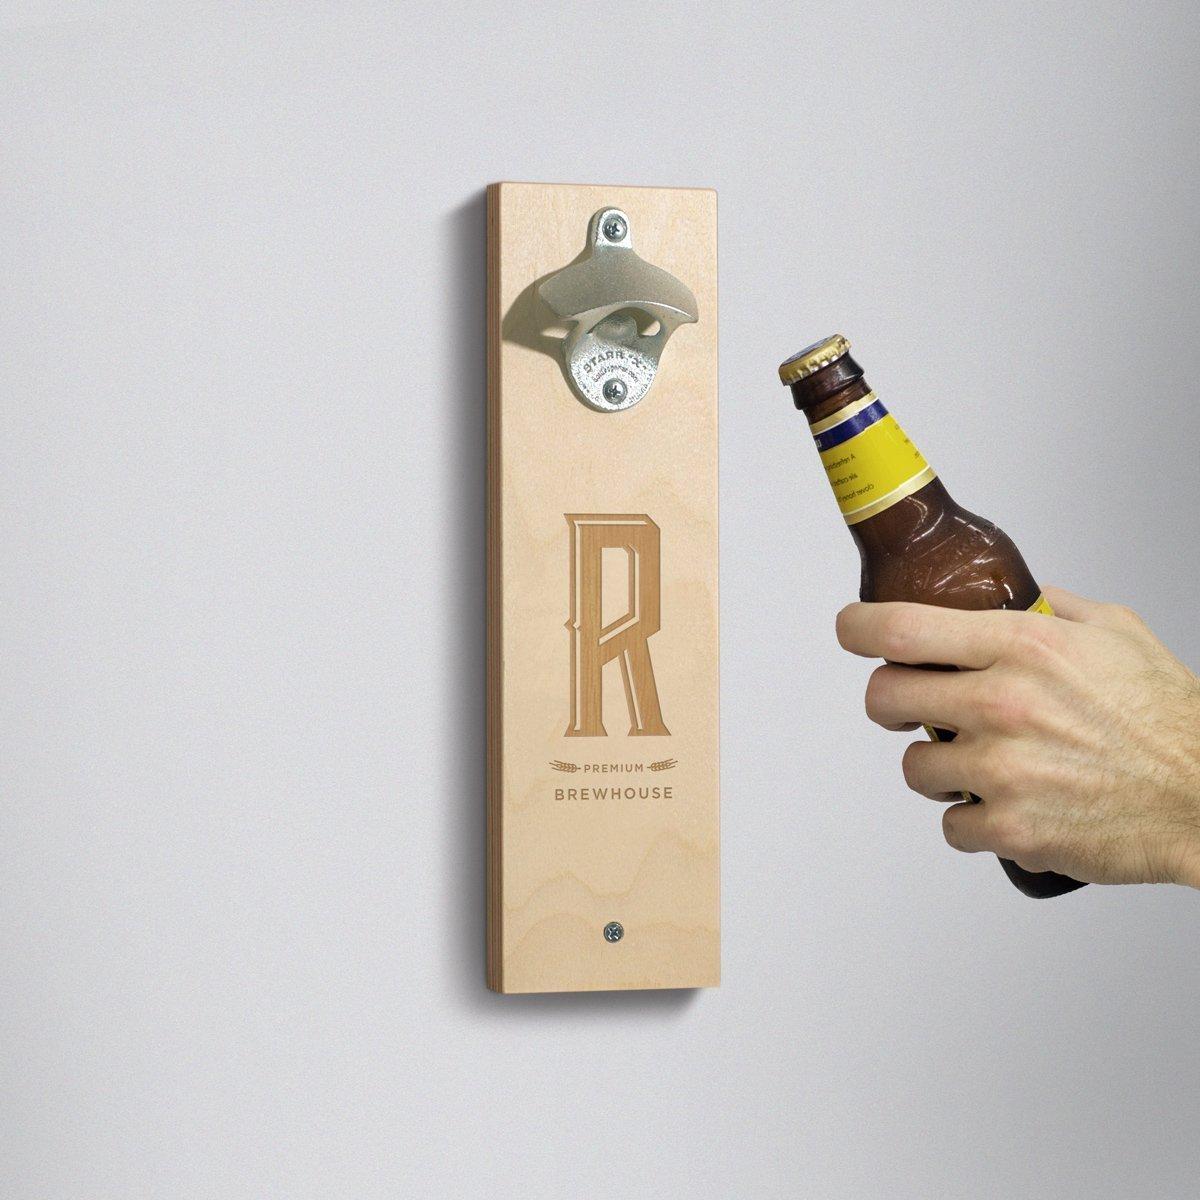 Amazon Com Personalized Wall Mounted Bottle Opener Monogram Industrial Gift For Him Gift For Beer Lovers Groomsman Gift Handmade